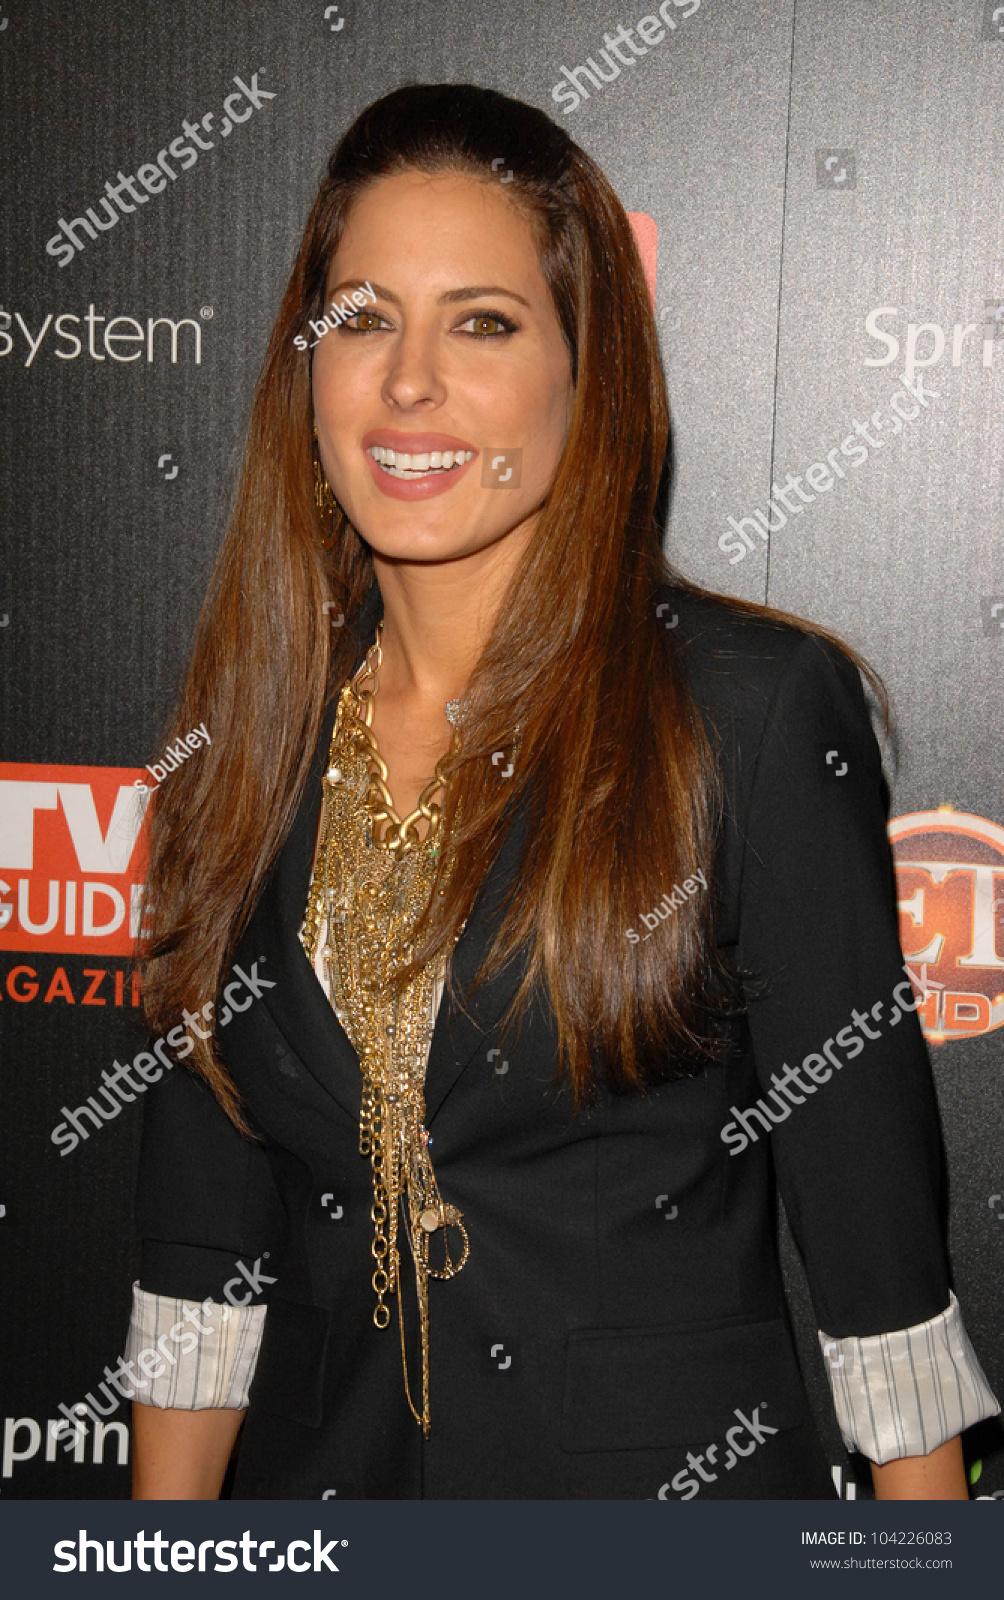 Kerri Kasem Tv Guide Magazines Hot Stock Photo 104226083 - Shutterstock